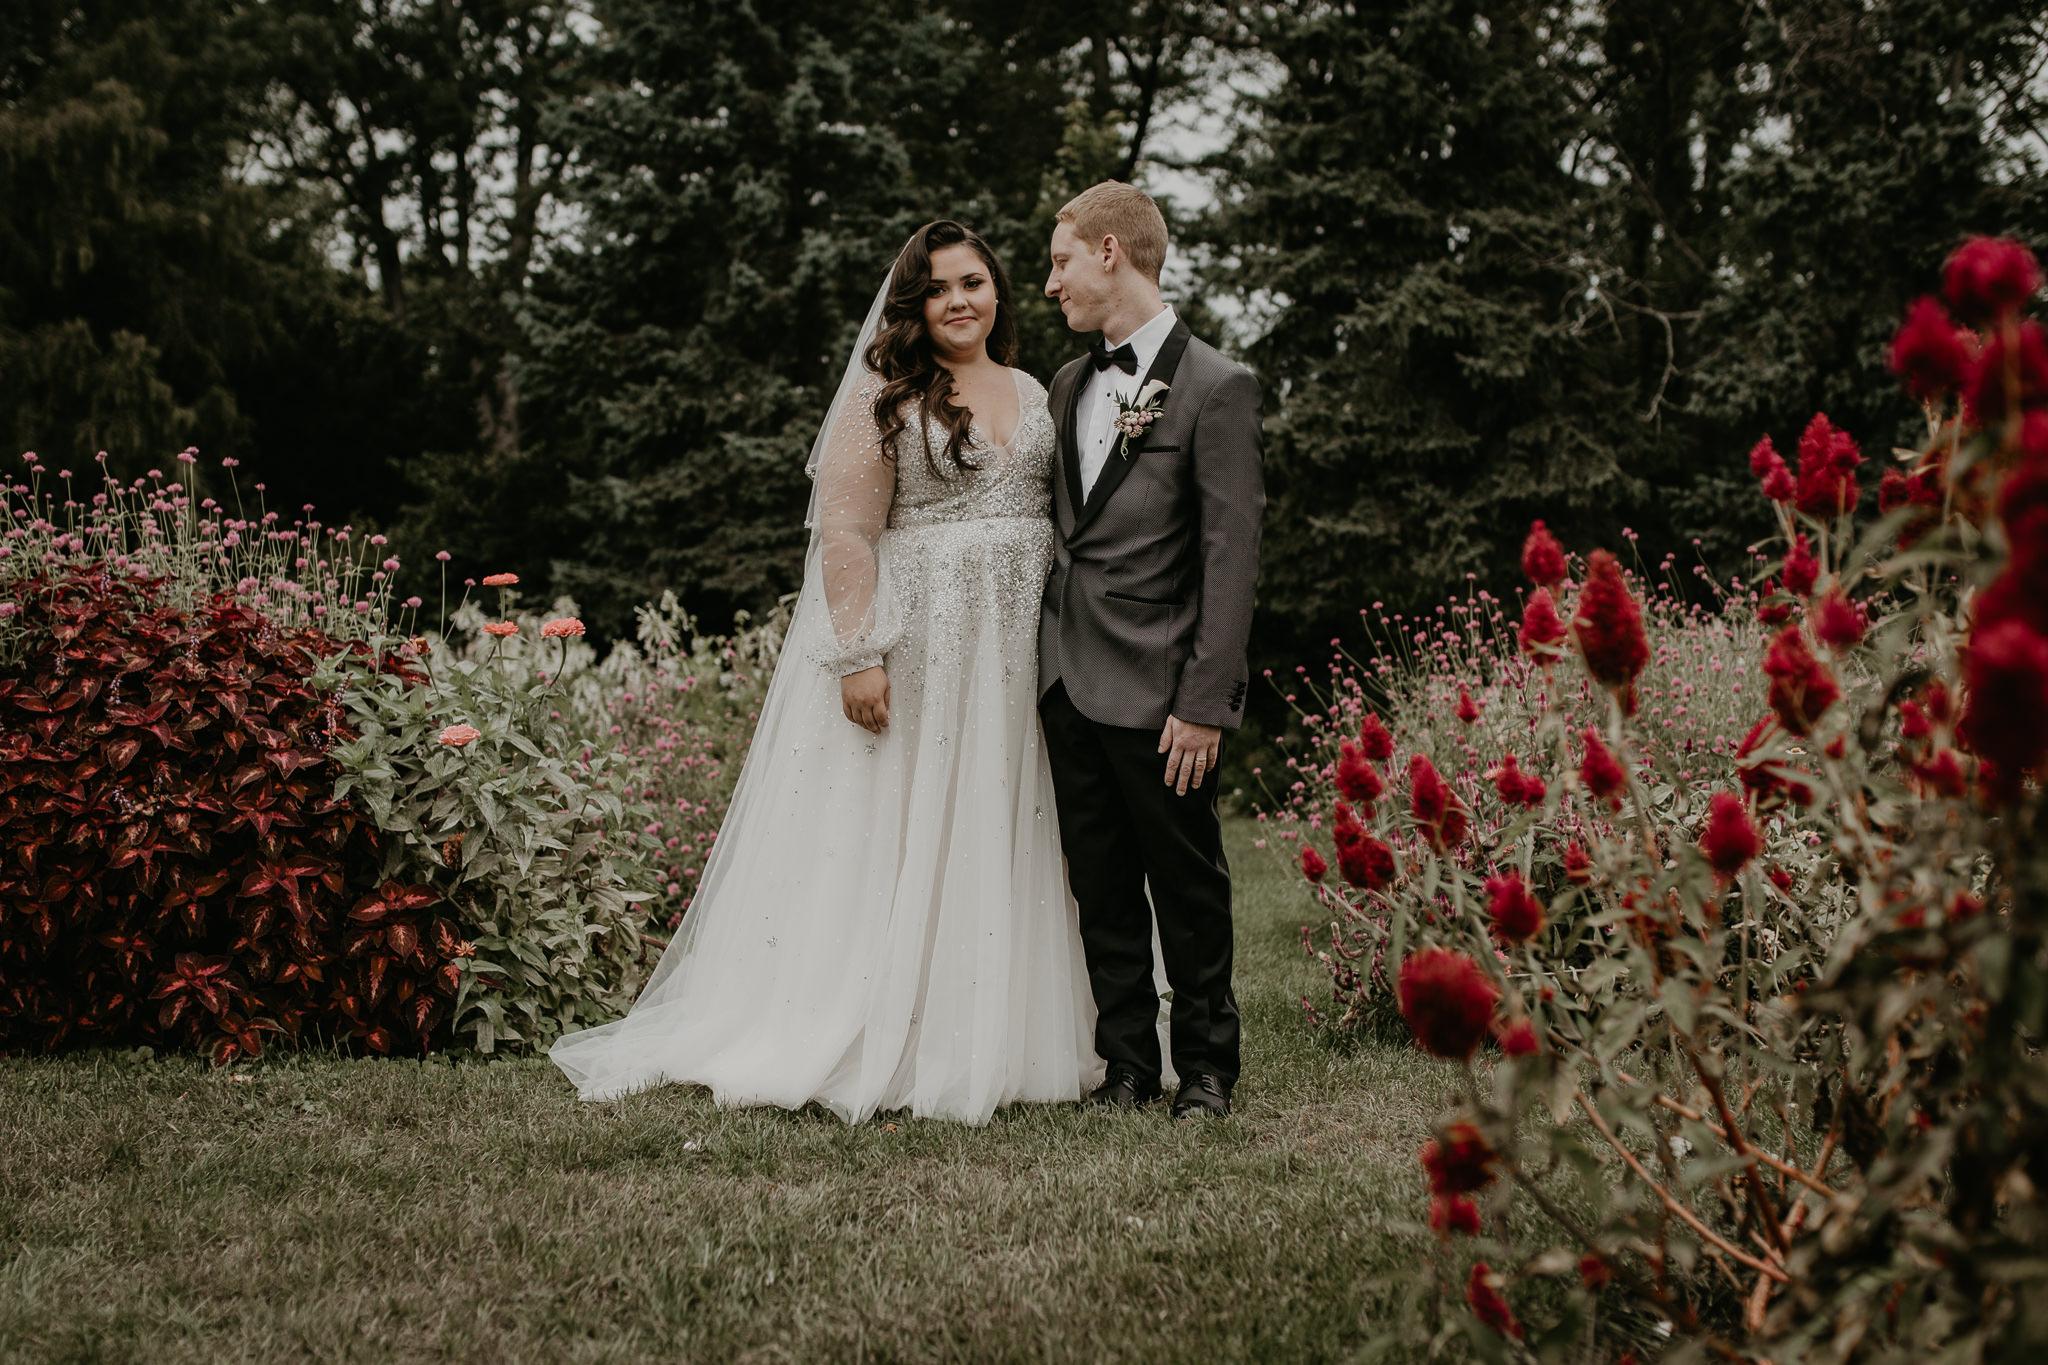 H+A_Hartford_Connecticut_RoseGarden_Wedding047.jpg